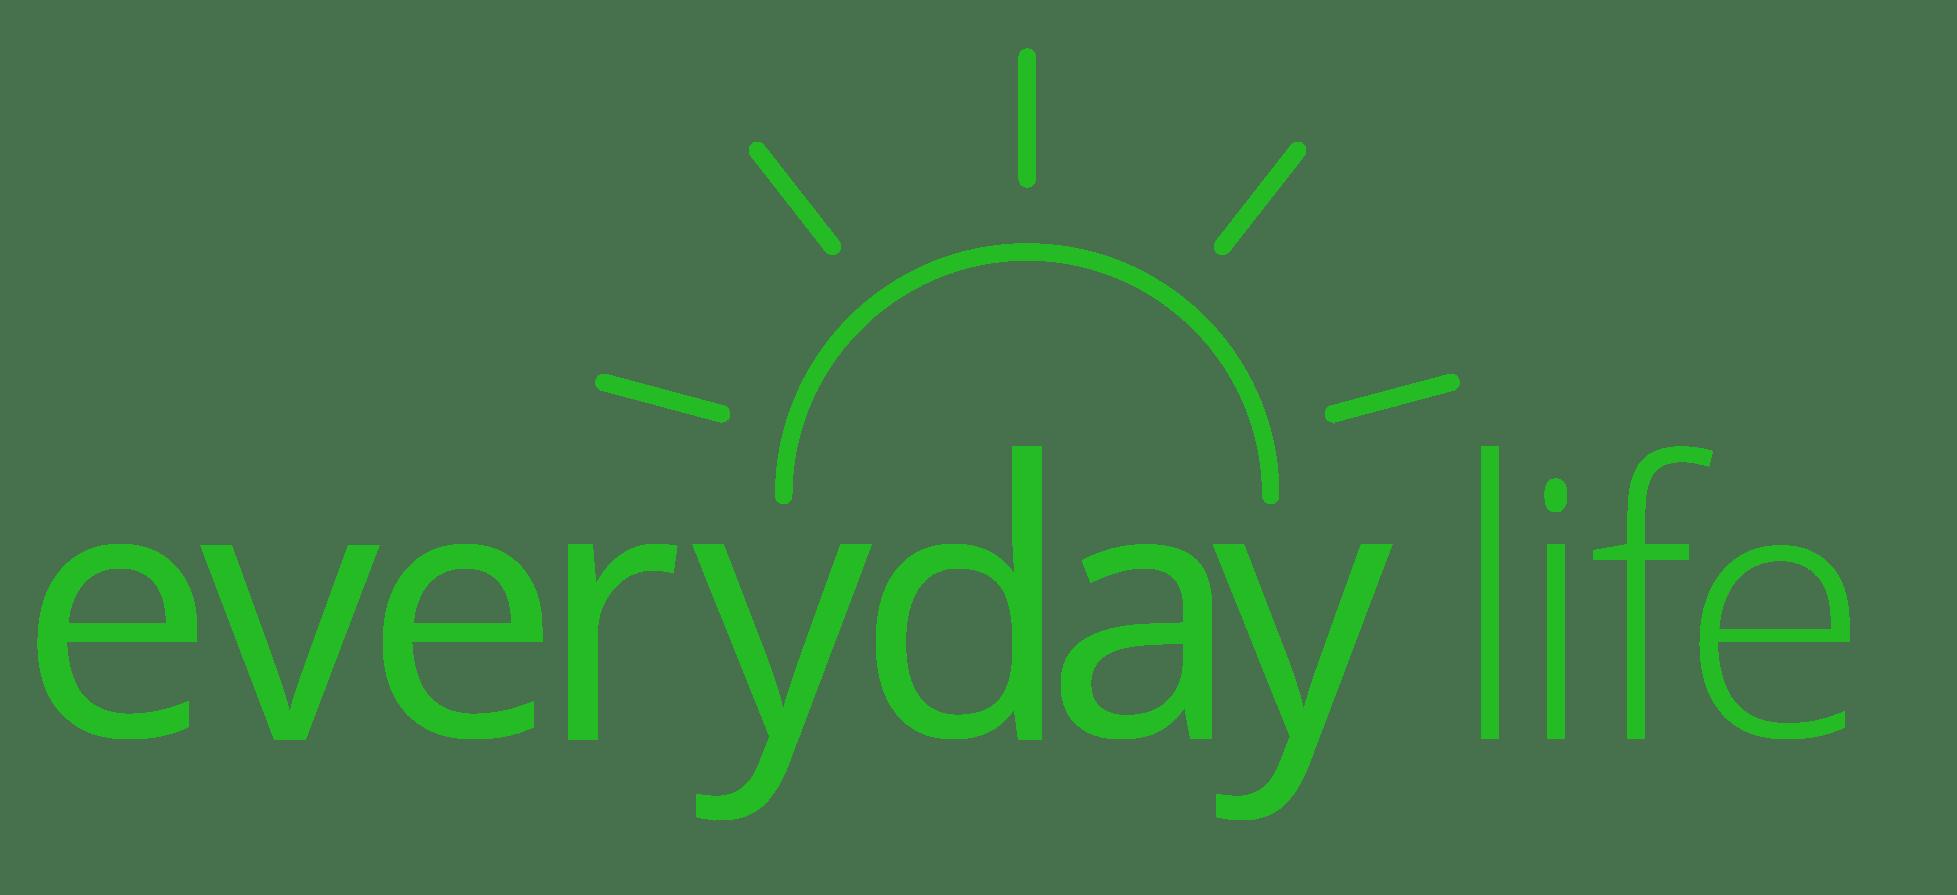 Logotipo de seguro de vida diaria